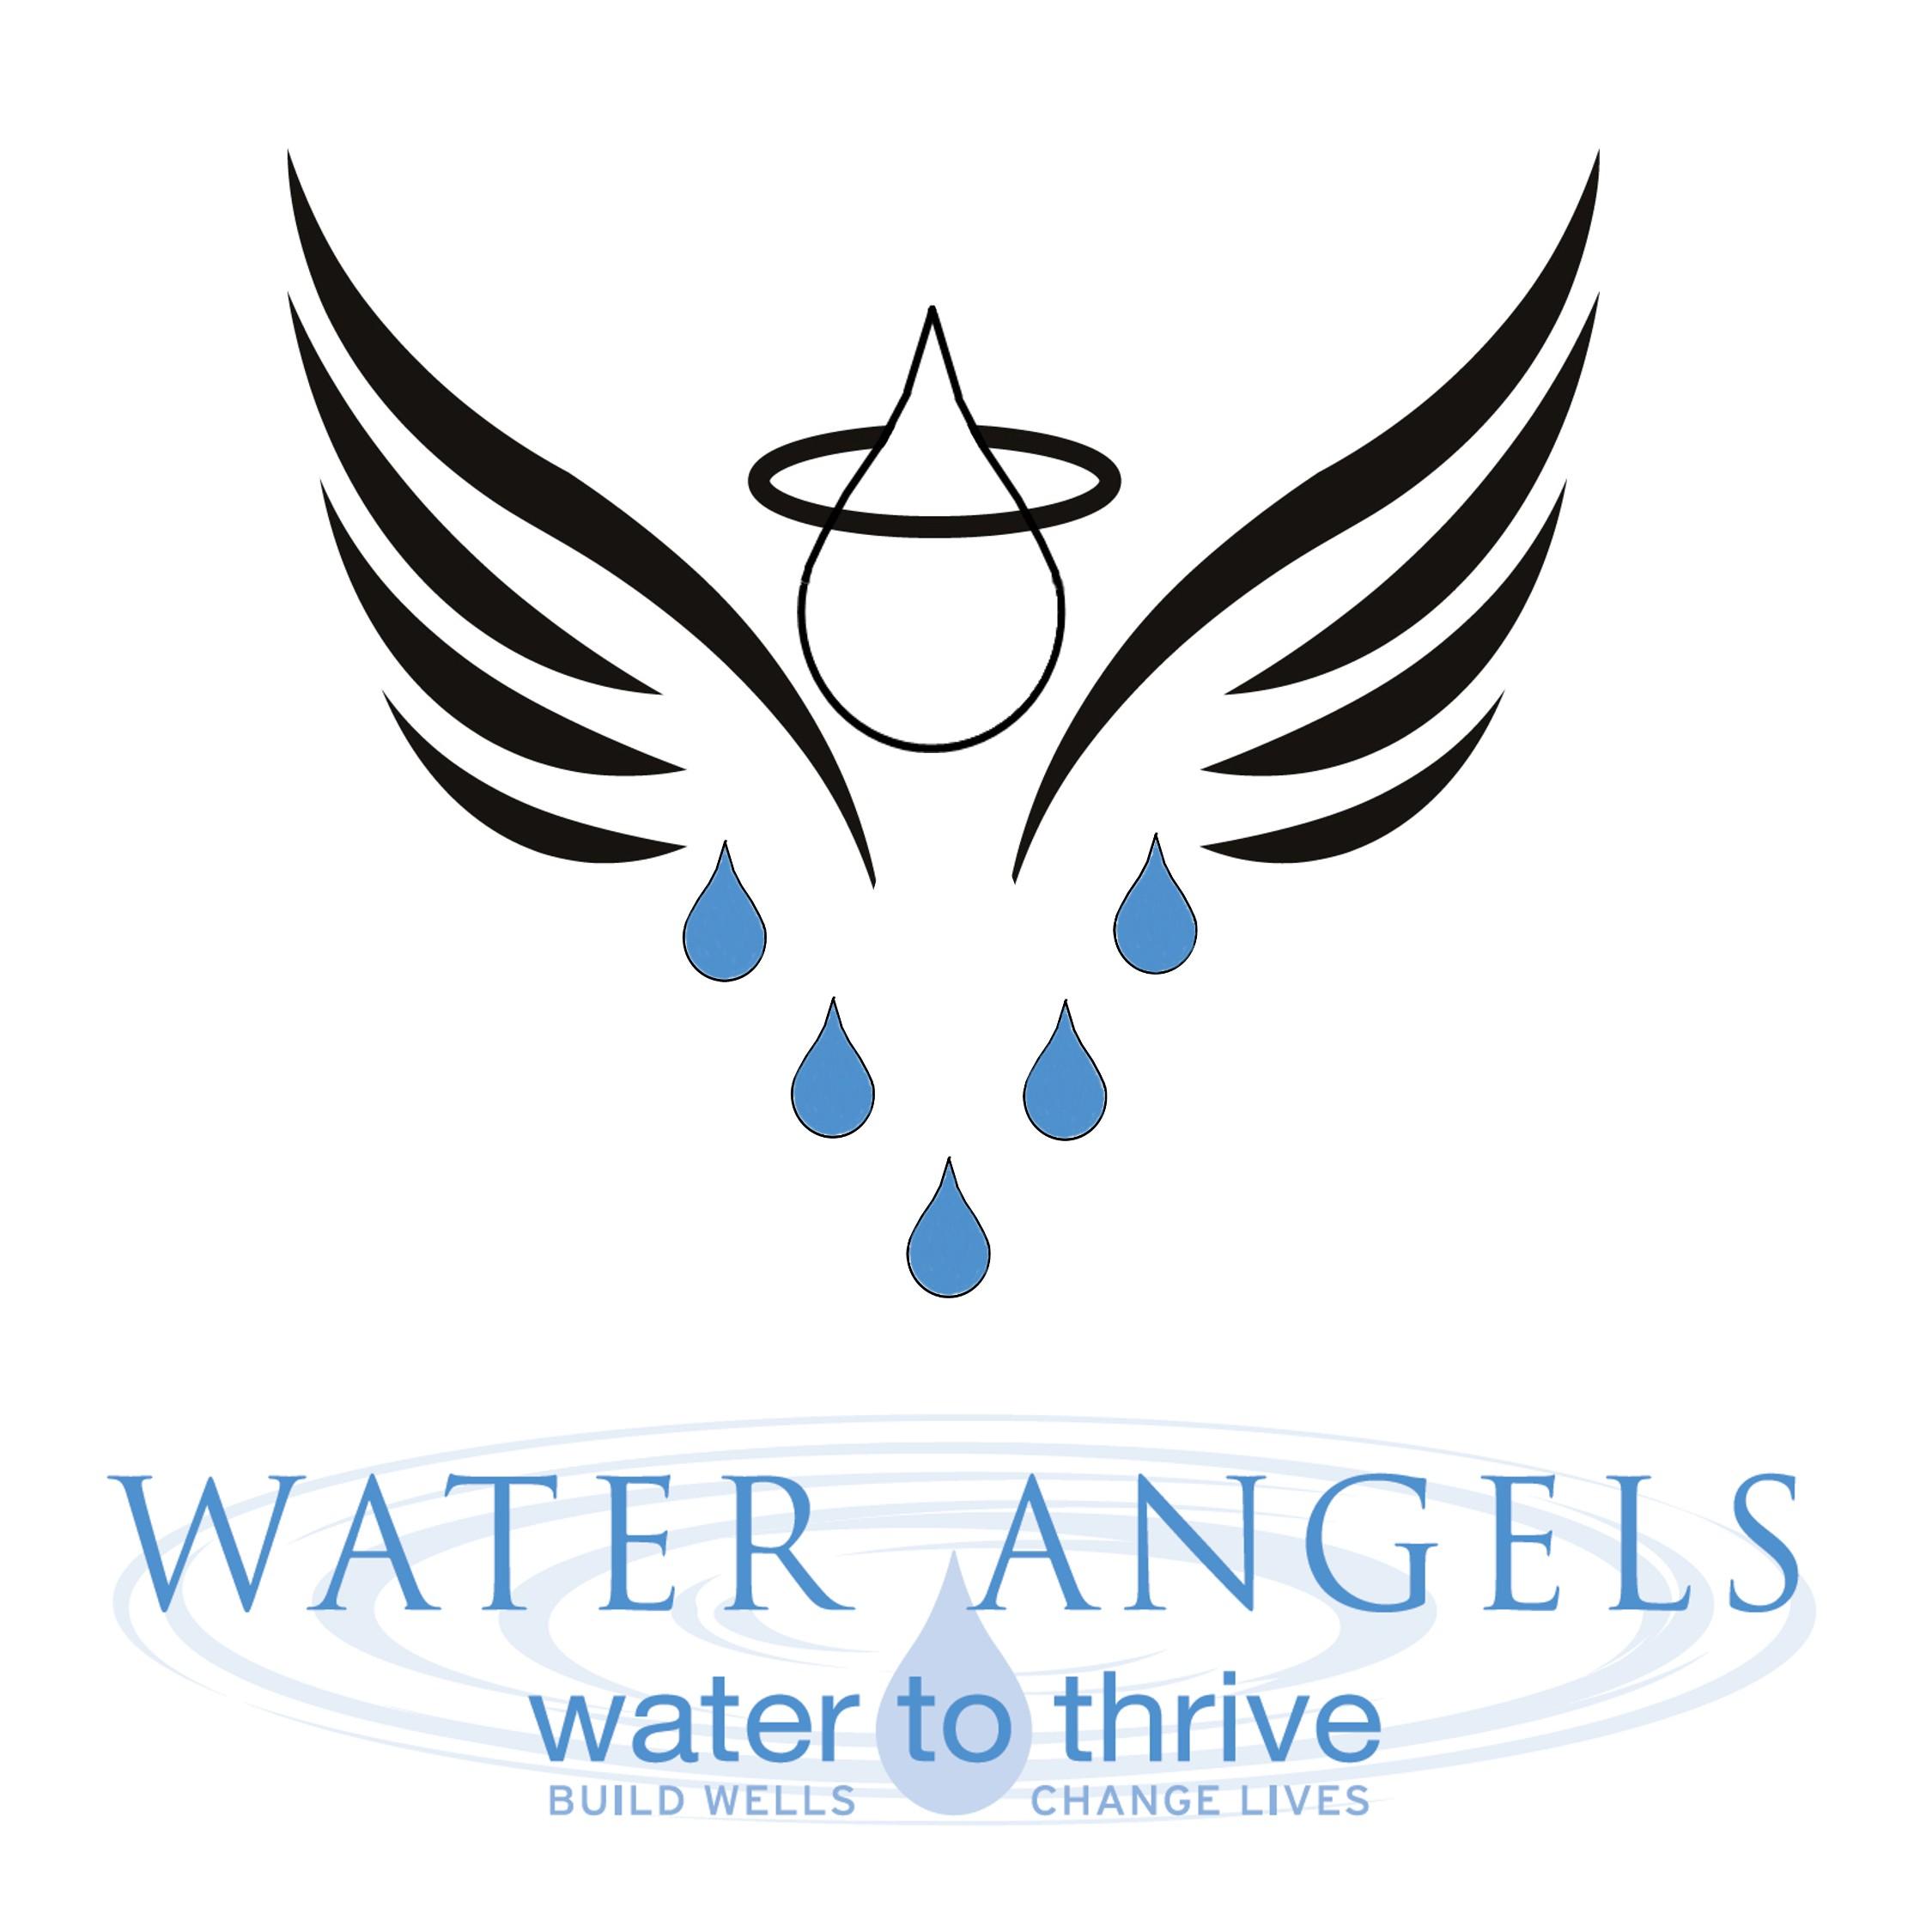 Waterangelcard2 Water To Thrive